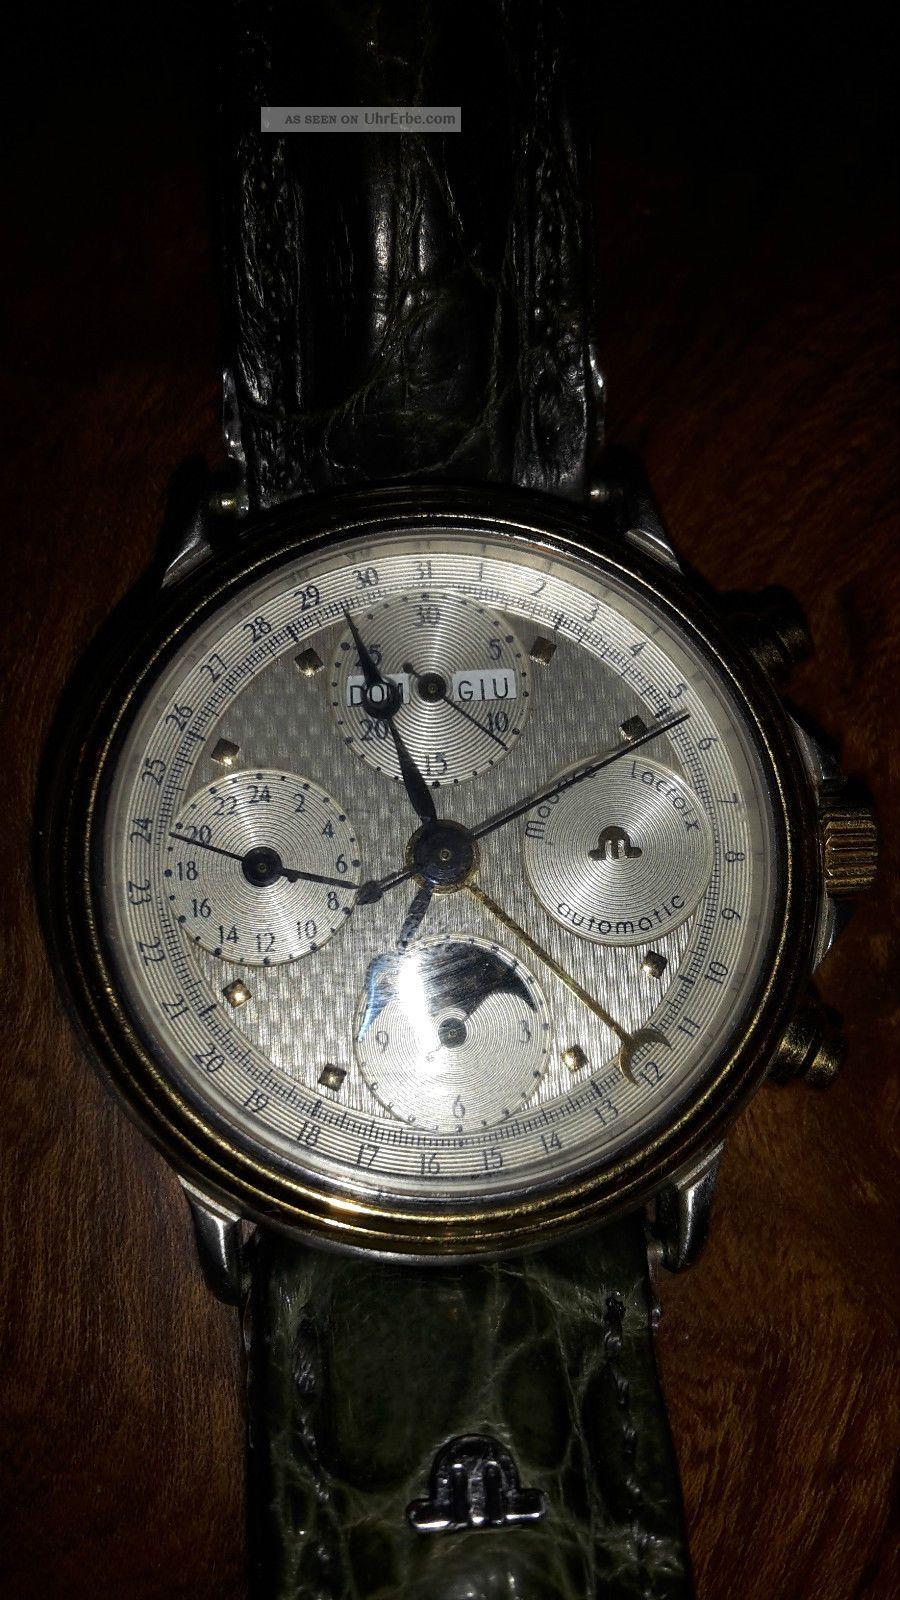 Limitierter Maurice Lacroix Crocodile Leder Luxusuhr 1a Autom 02981 Armbanduhren Bild